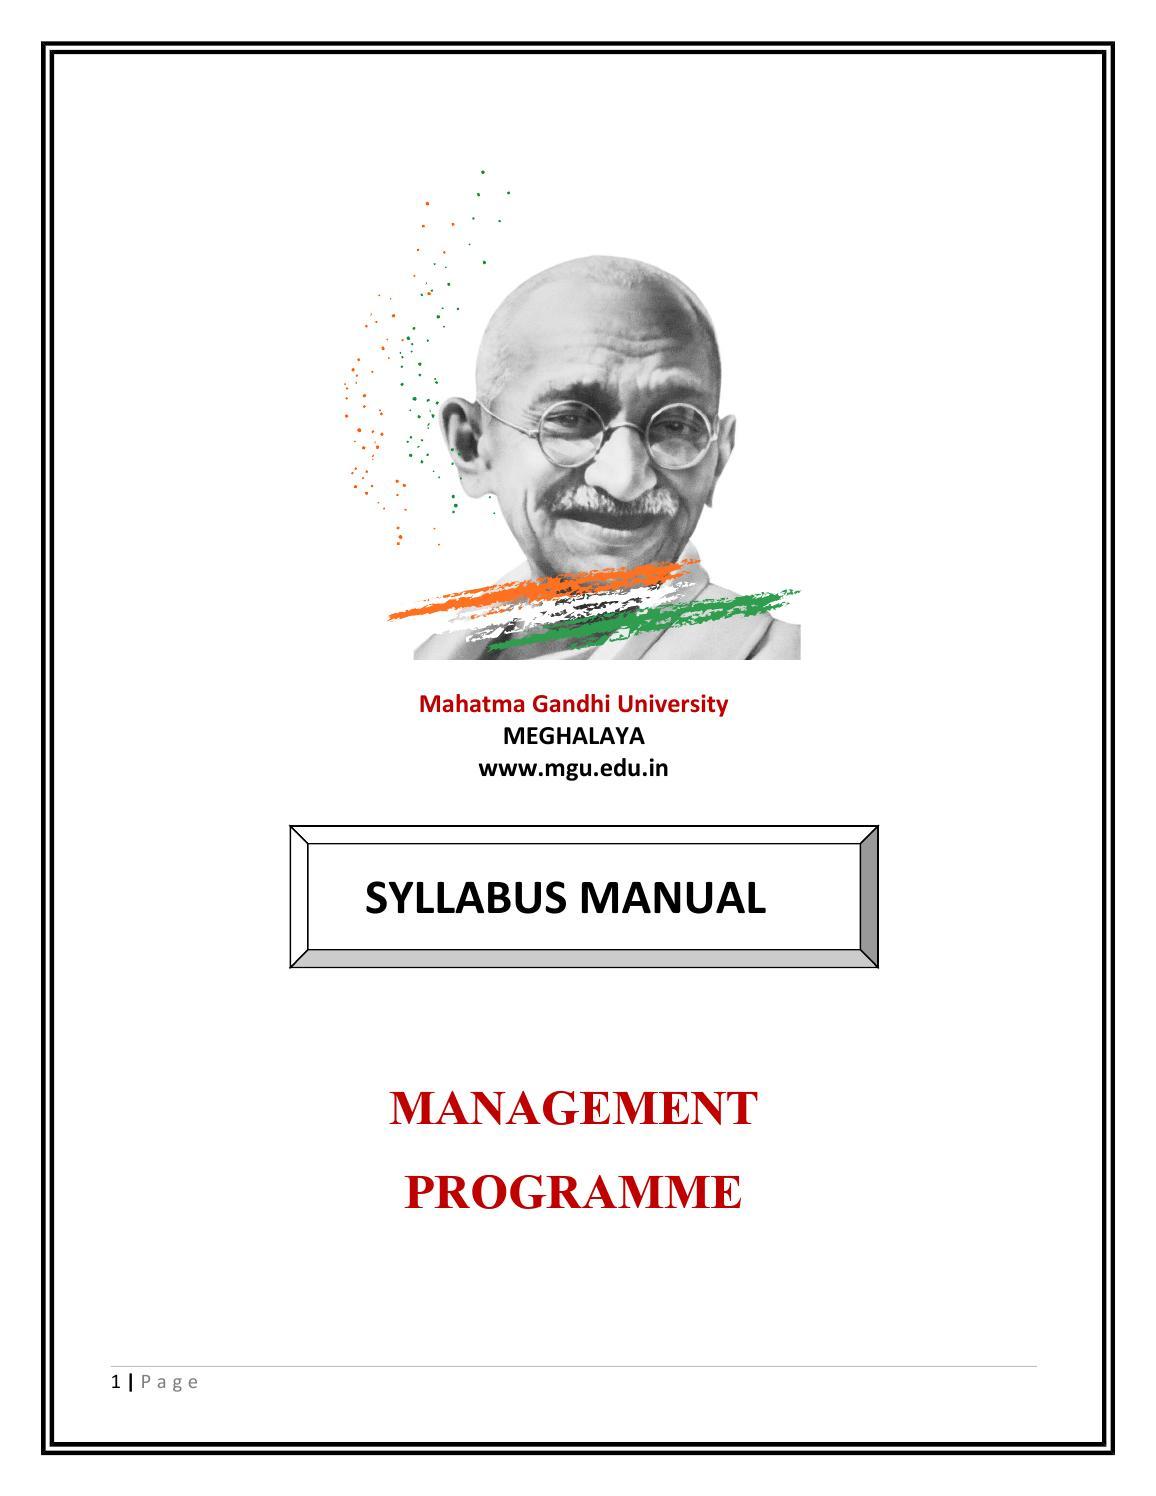 MBA- Retail Management Programme by Mahatma Gandhi